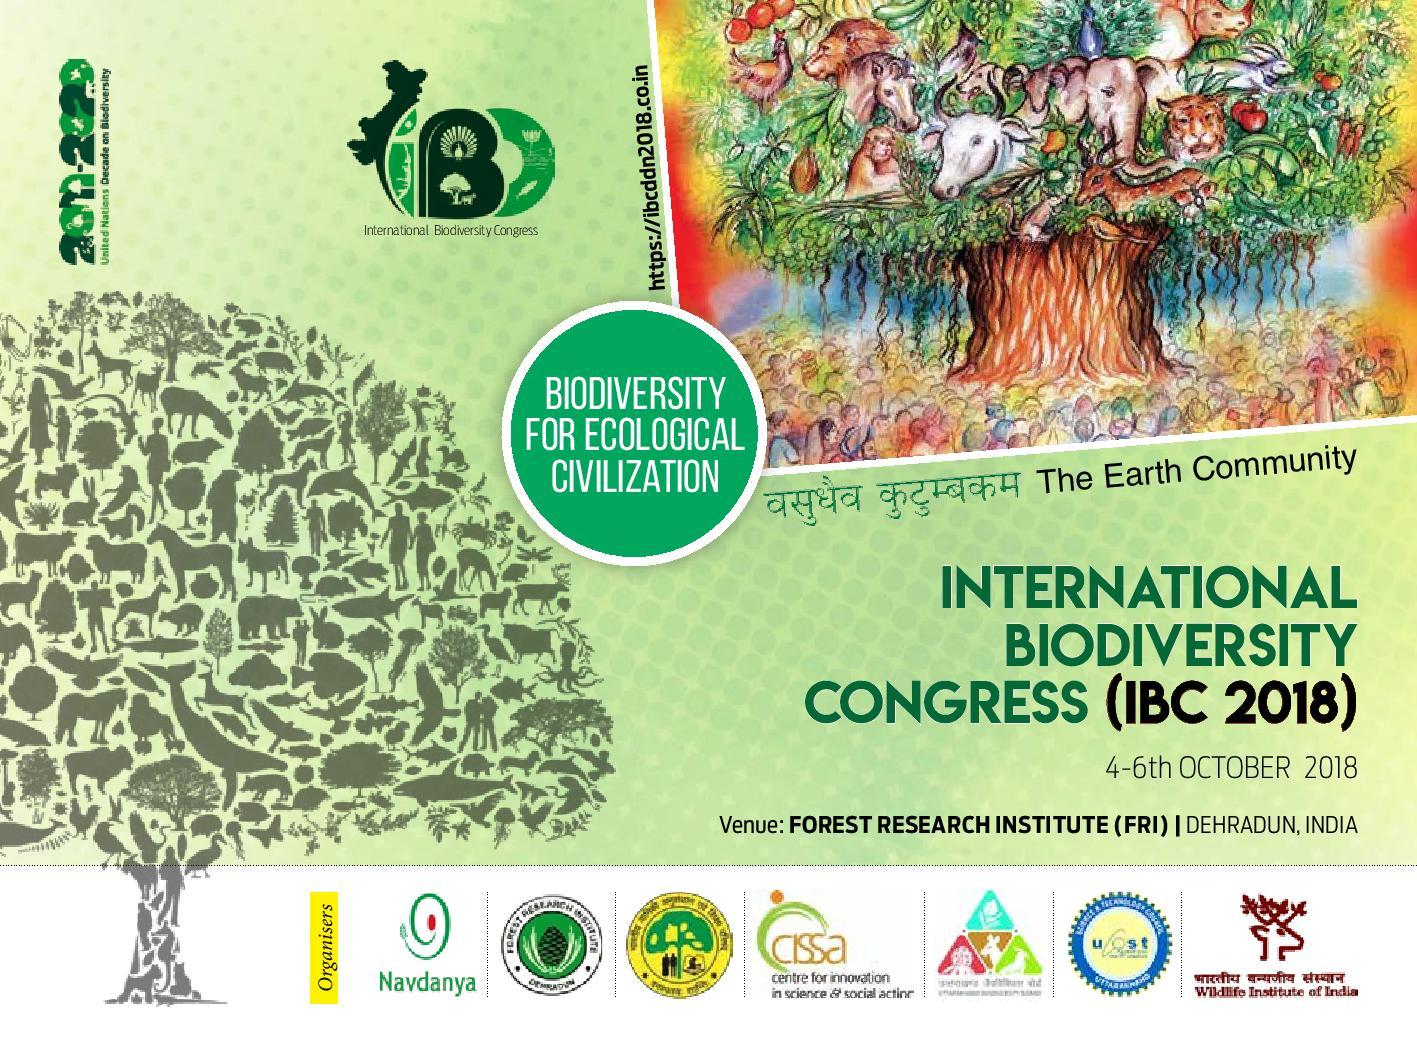 International Biodiversity Congress